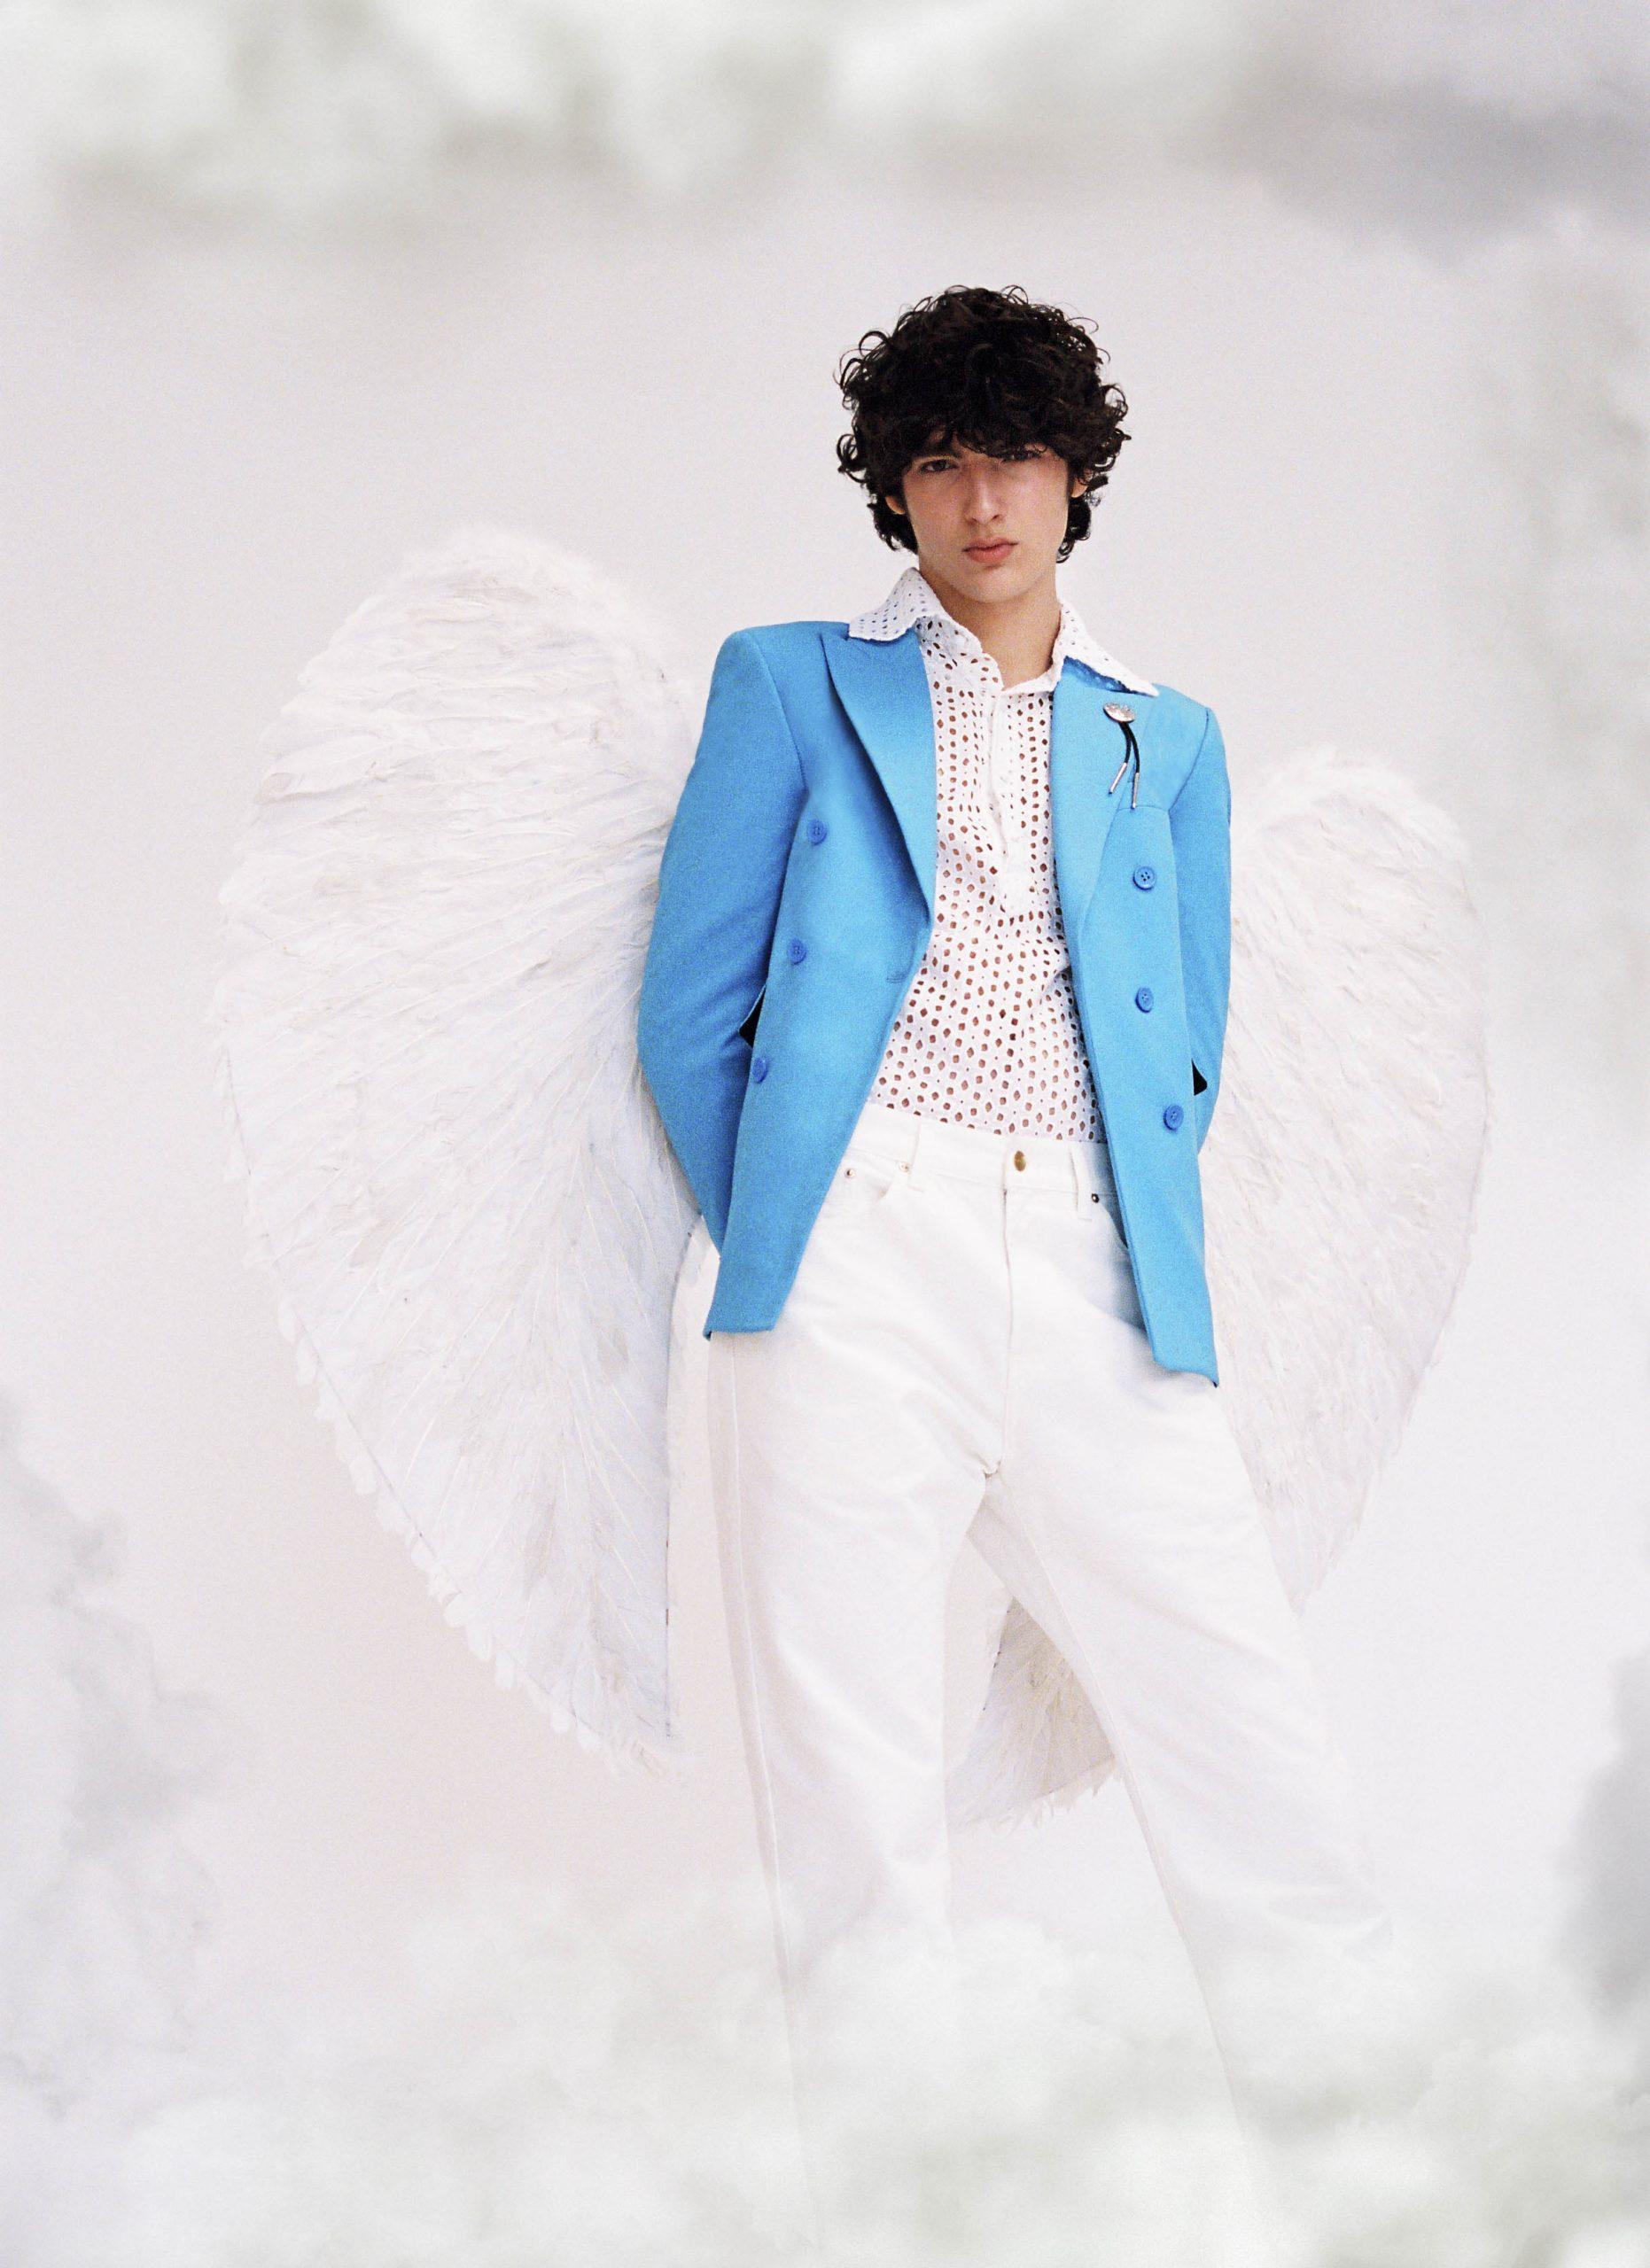 Heaven & Hell by Raúl Cordoba Heaven & Hell by Raúl Cordoba Vanity Teen Menswear & new faces magazine